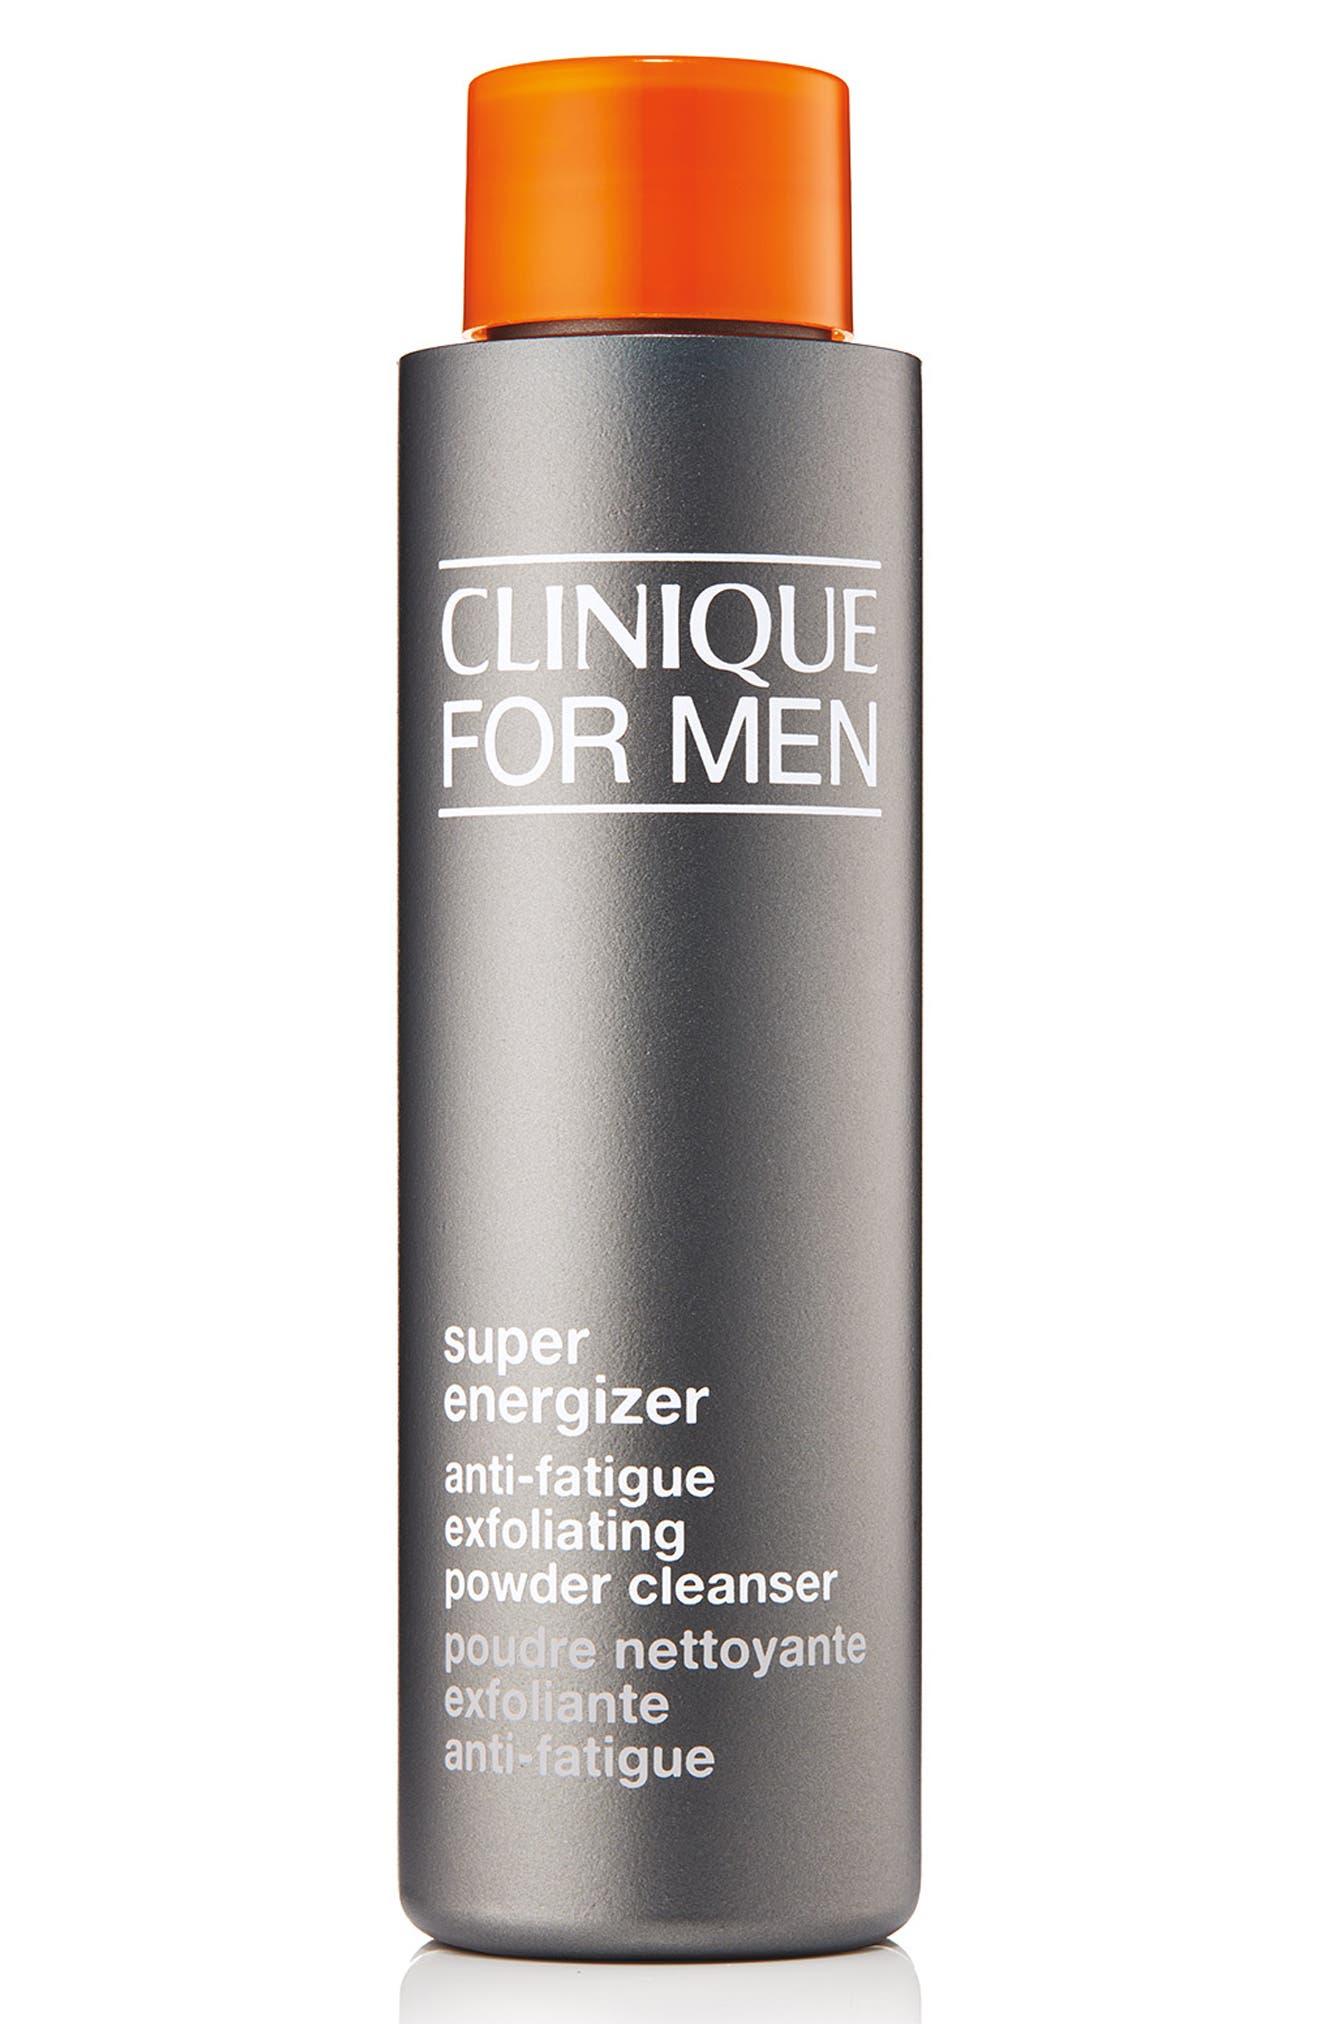 CLINIQUE for Men Super Energizer Anti-Fatigue Exfoliating Powder Cleanser, Main, color, 000